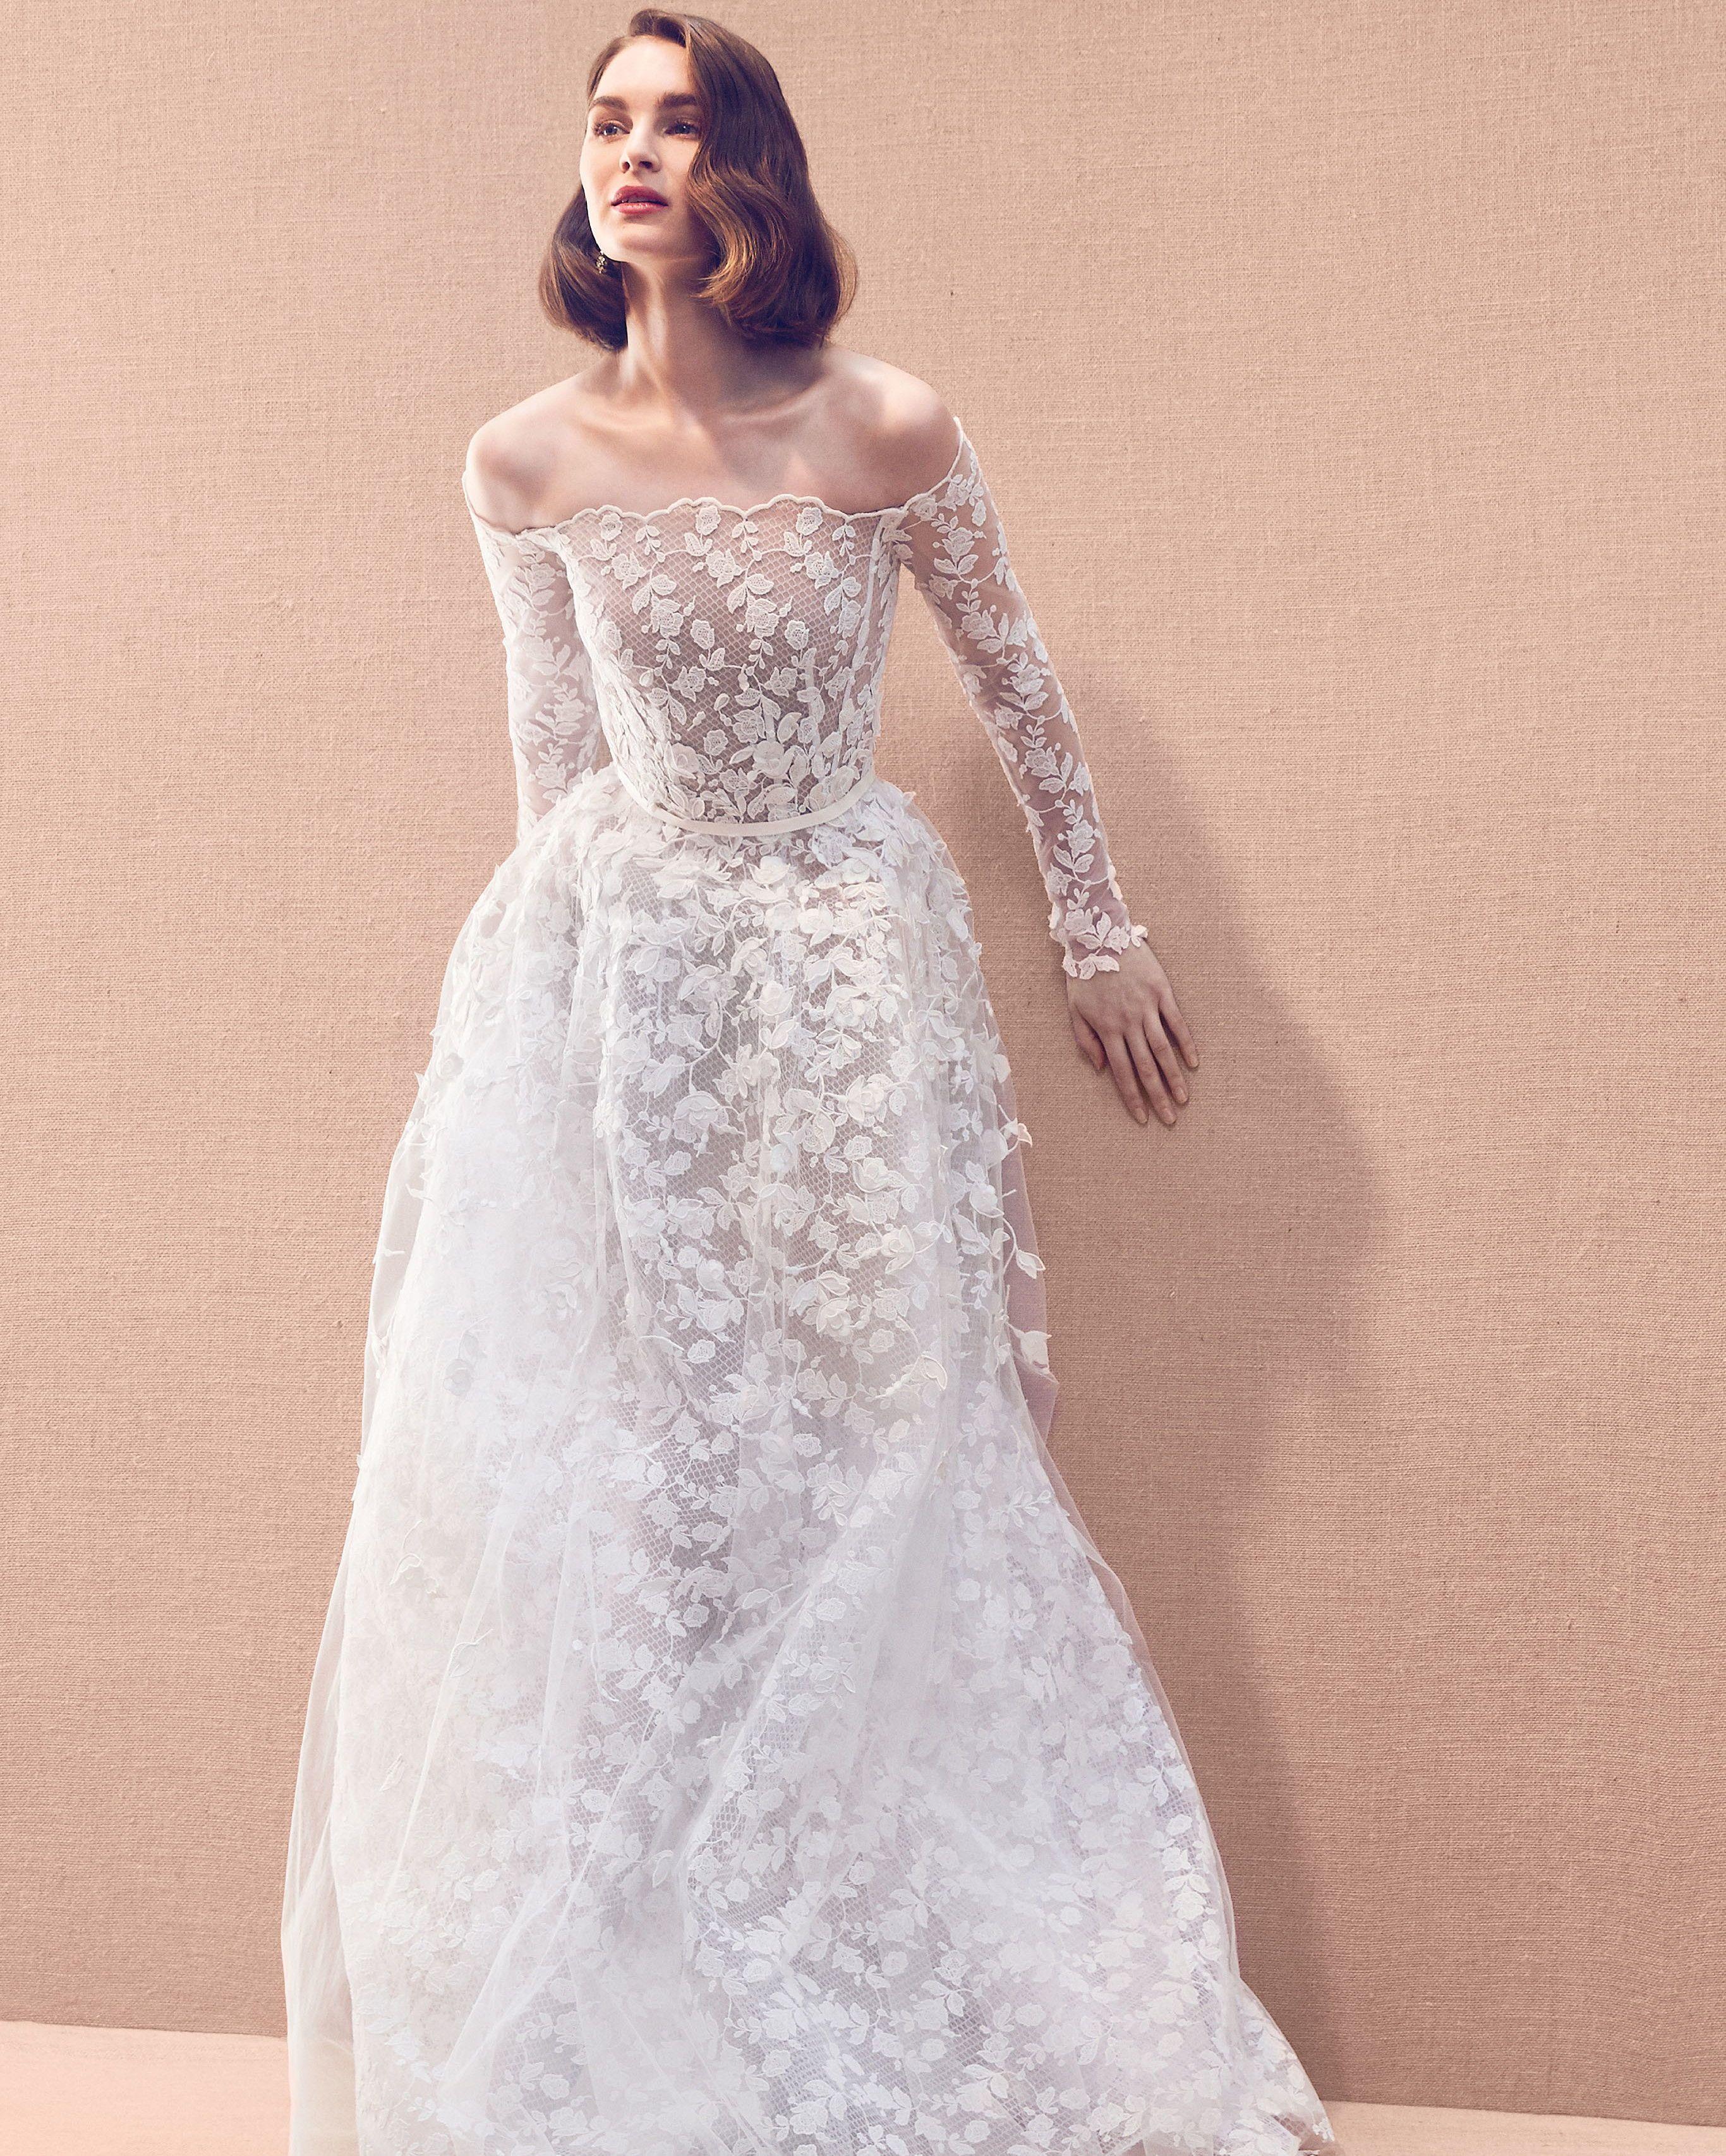 Oscar De La Renta Spring 2020 Wedding Dress Collection Wedding Dress Long Sleeve Wedding Dress Trends Wedding Dresses [ 3412 x 2732 Pixel ]